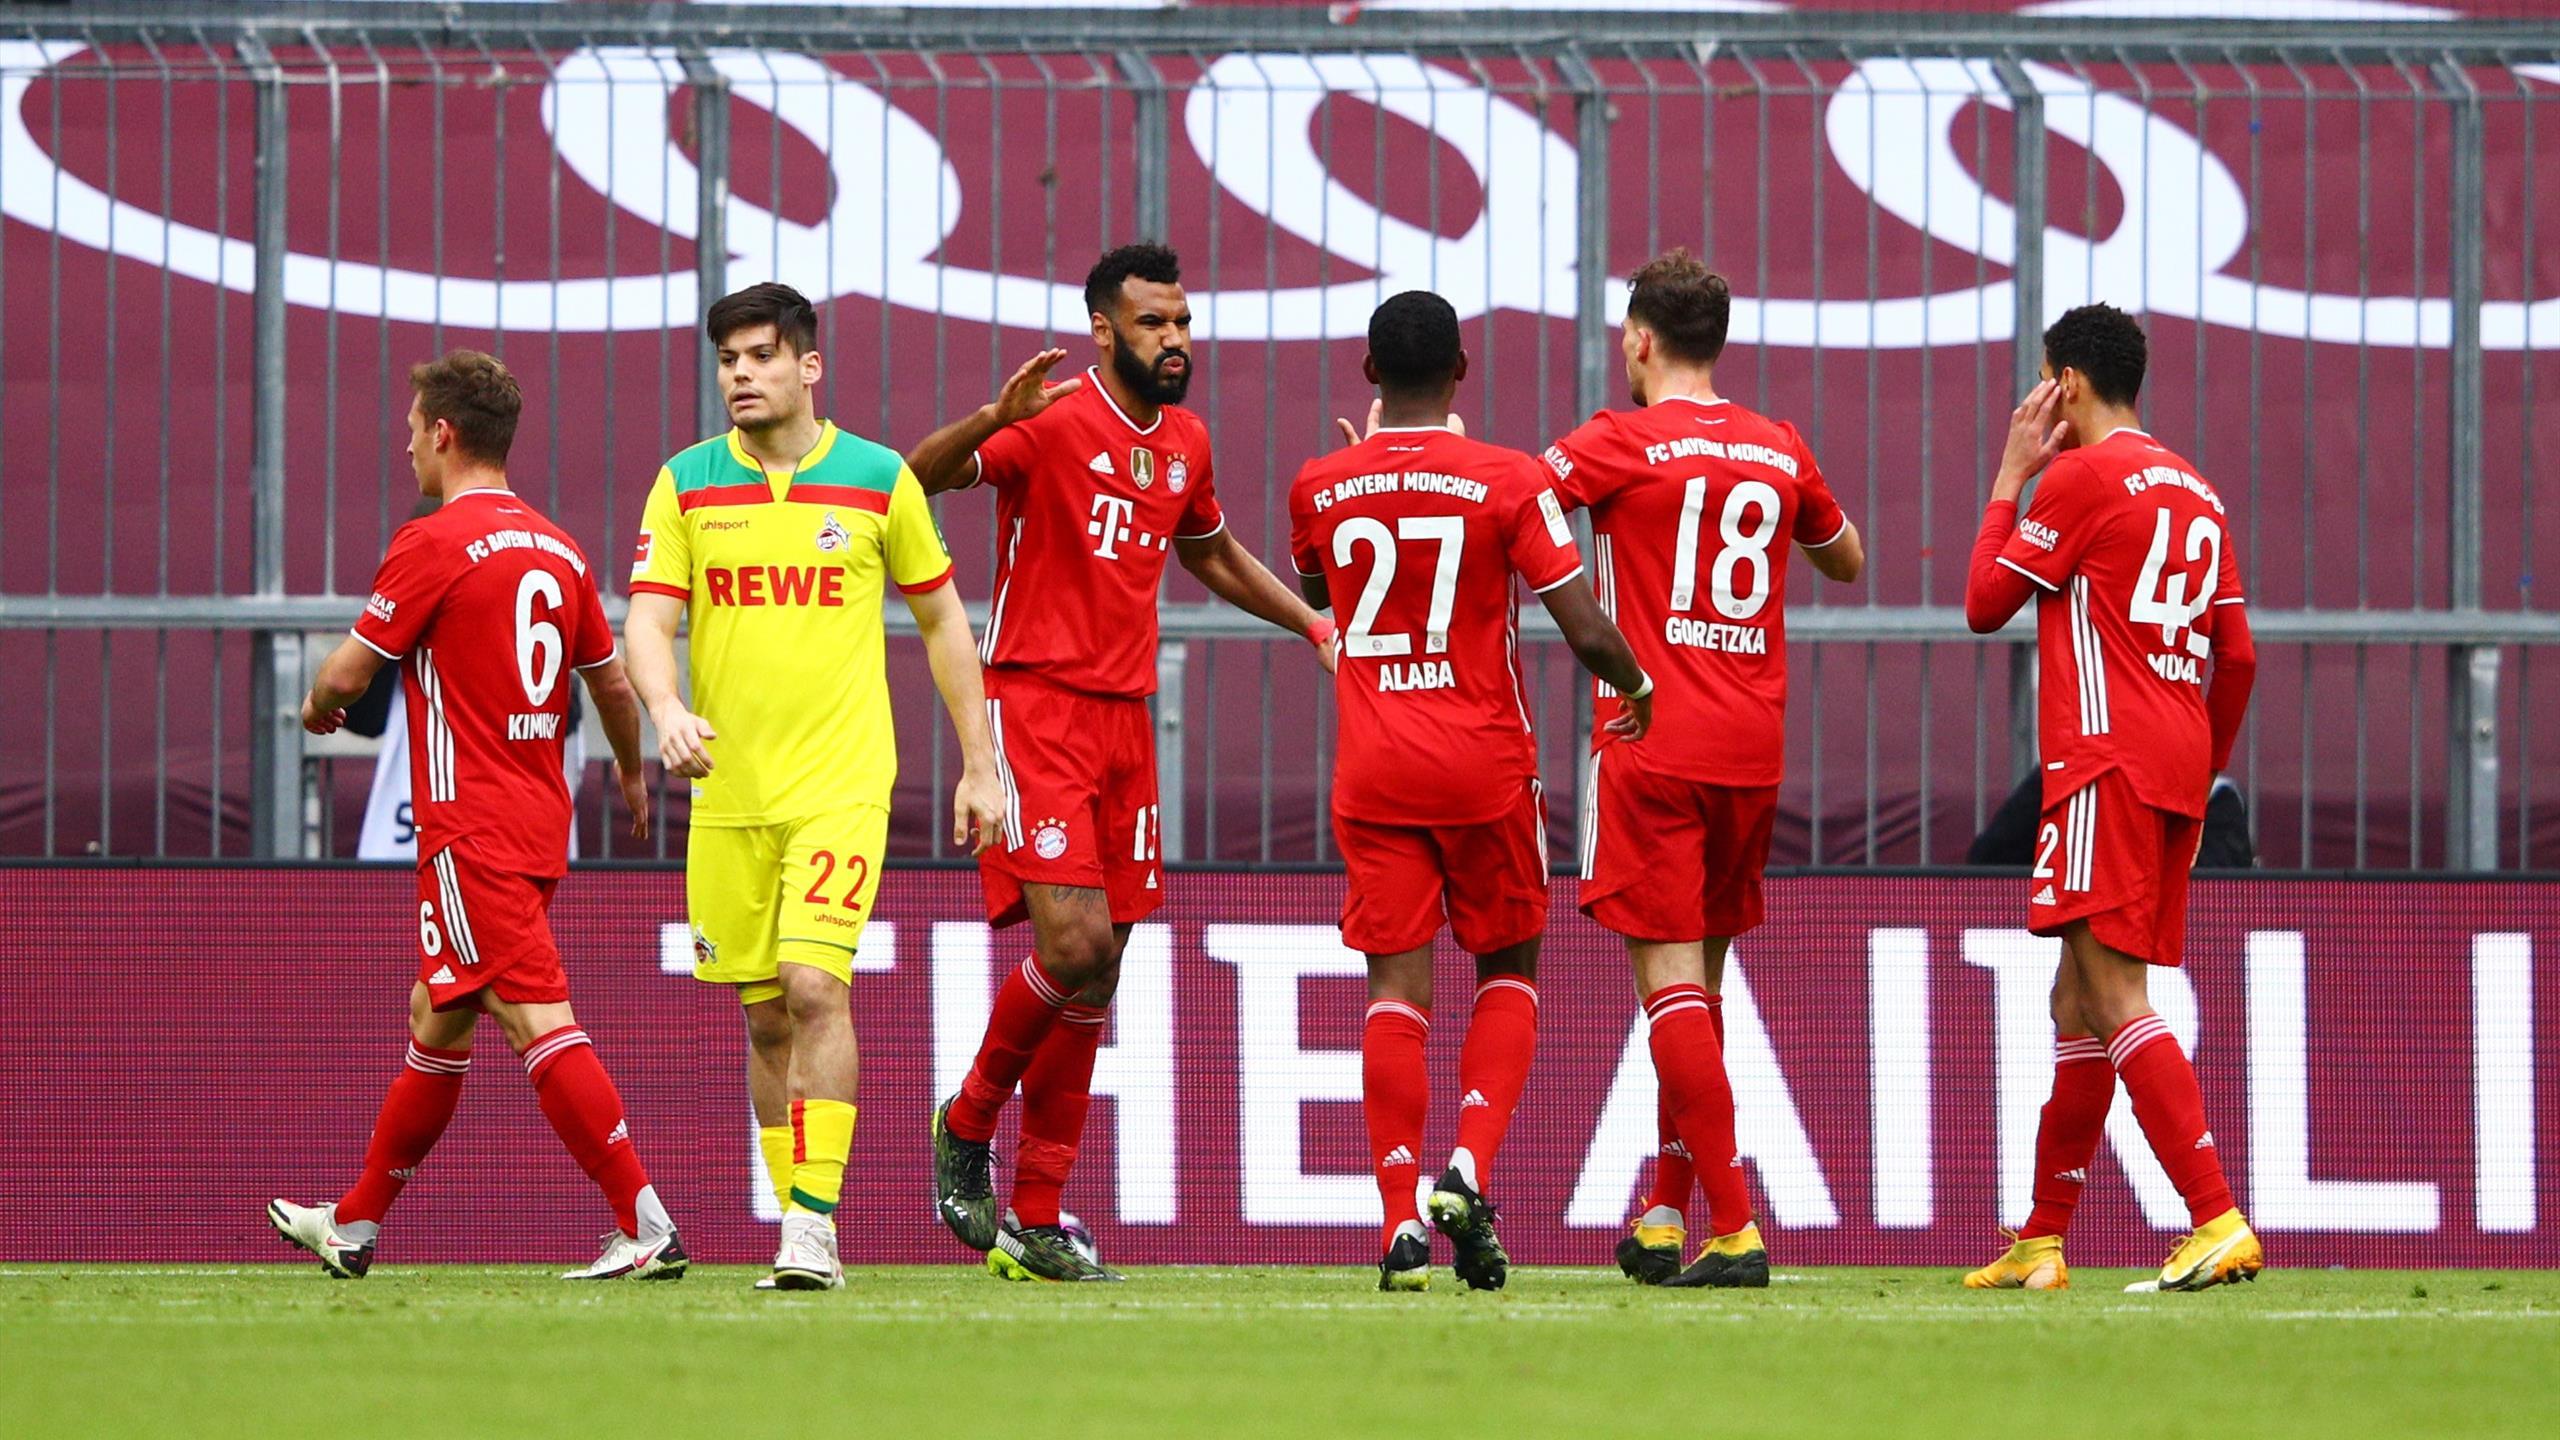 Bundesliga – Bayern crushes Cologne thanks to Lewandowski, Gnabry and  Choupo-Moting (5-1) | Today24 News English